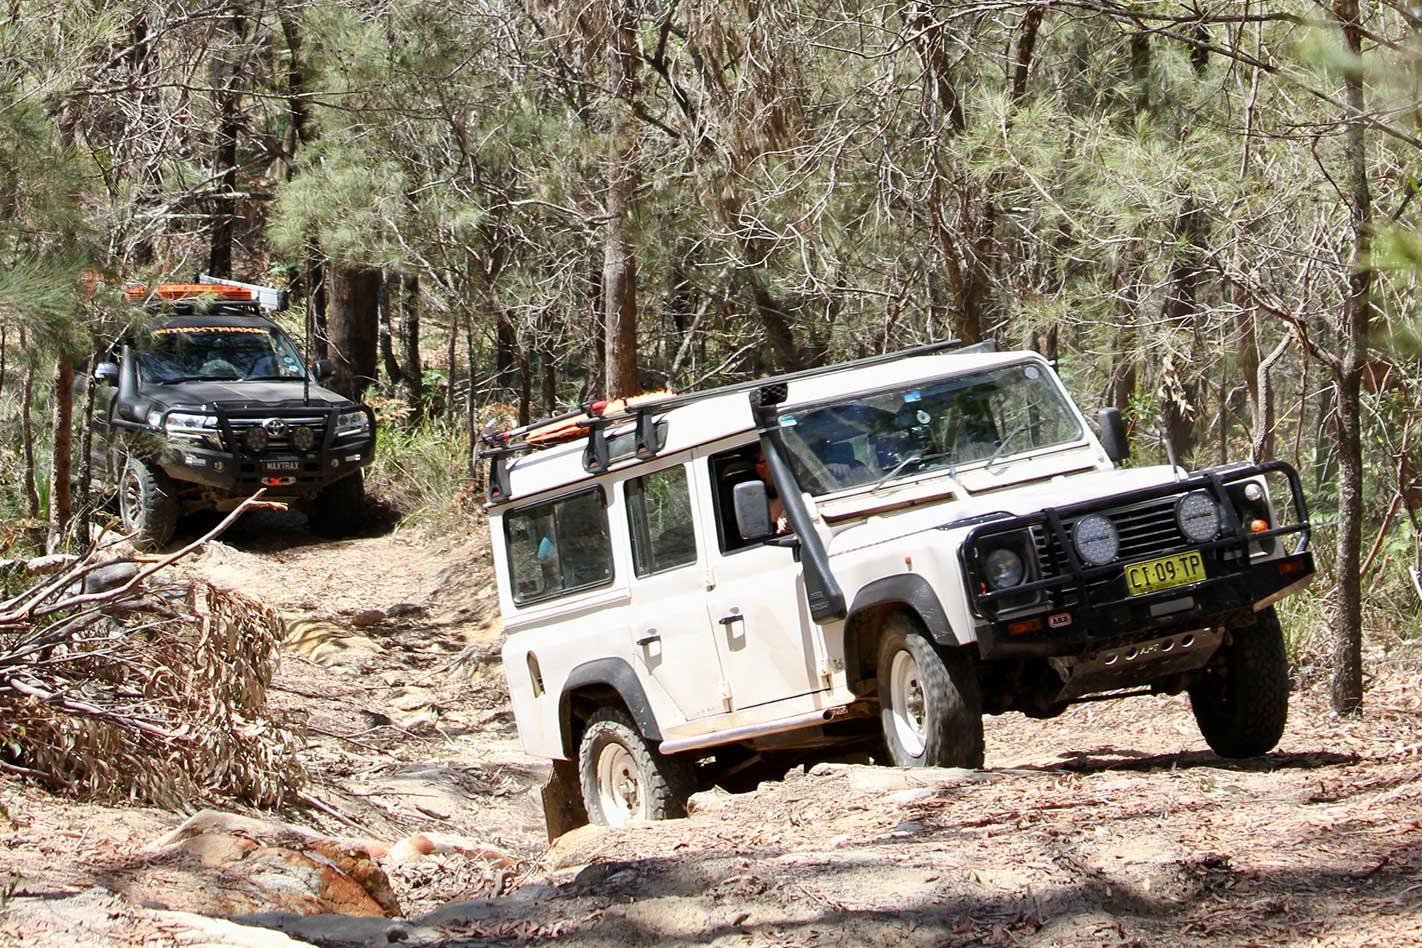 4x4 Australia Advertisers' trip in Coffs Harbour, NSW